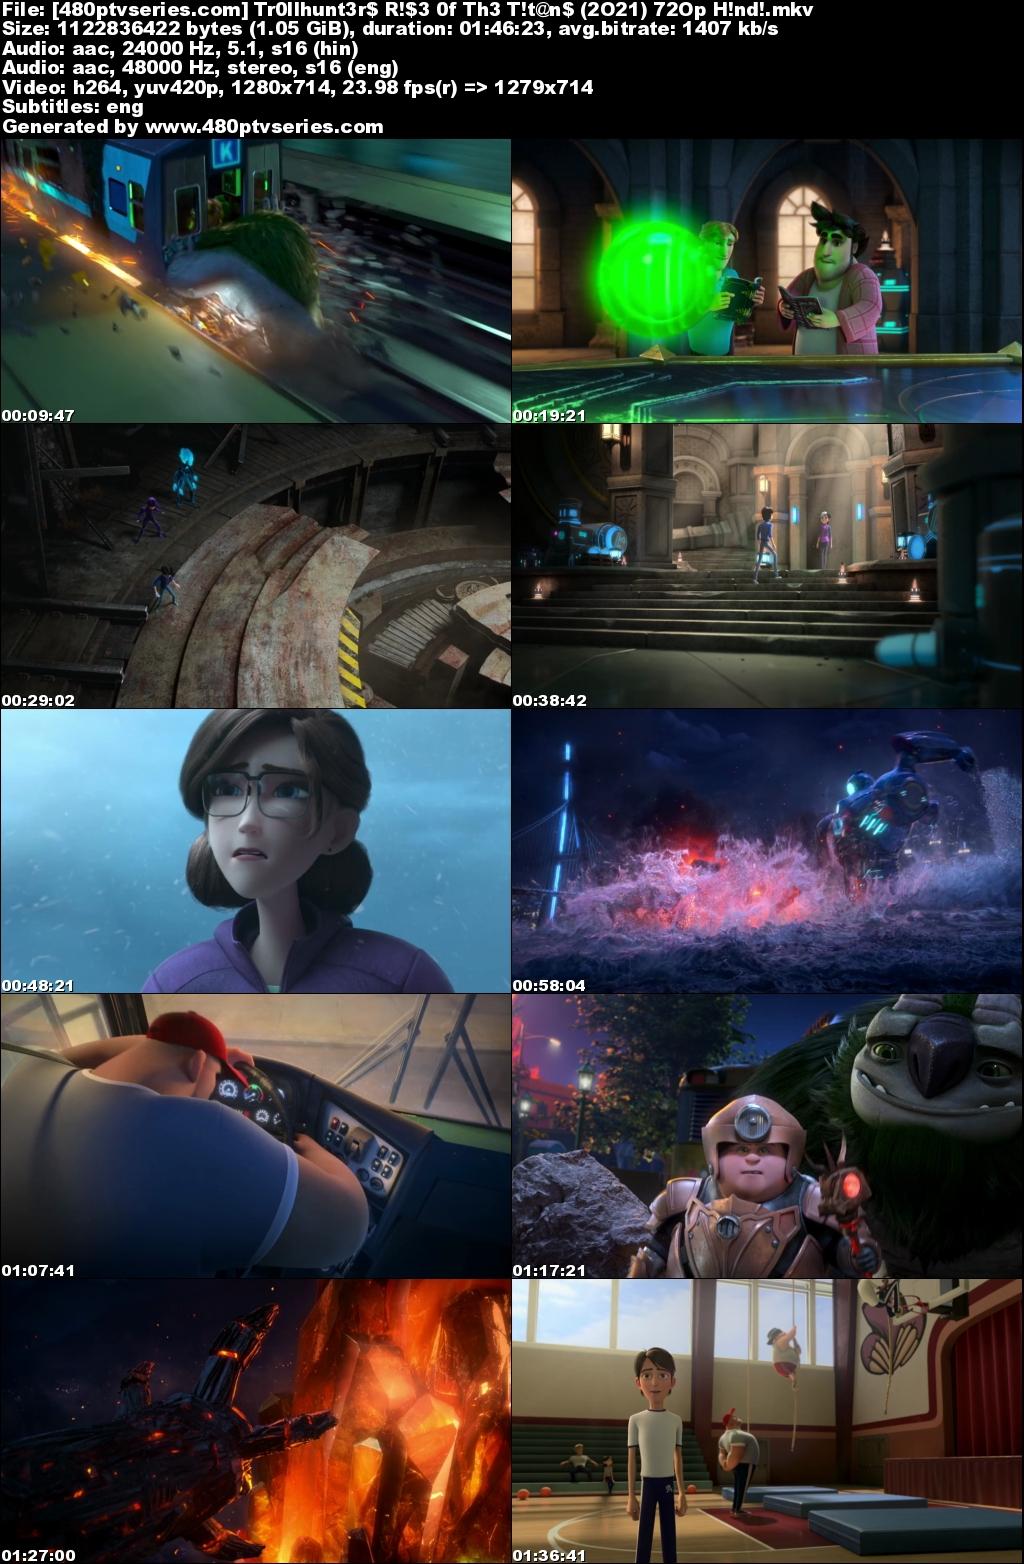 Download Trollhunters: Rise of the Titans (2021) Hindi Dual Audio 1GB WebRip 720p Free Watch Online Full Movie Download Worldfree4u 9xmovies